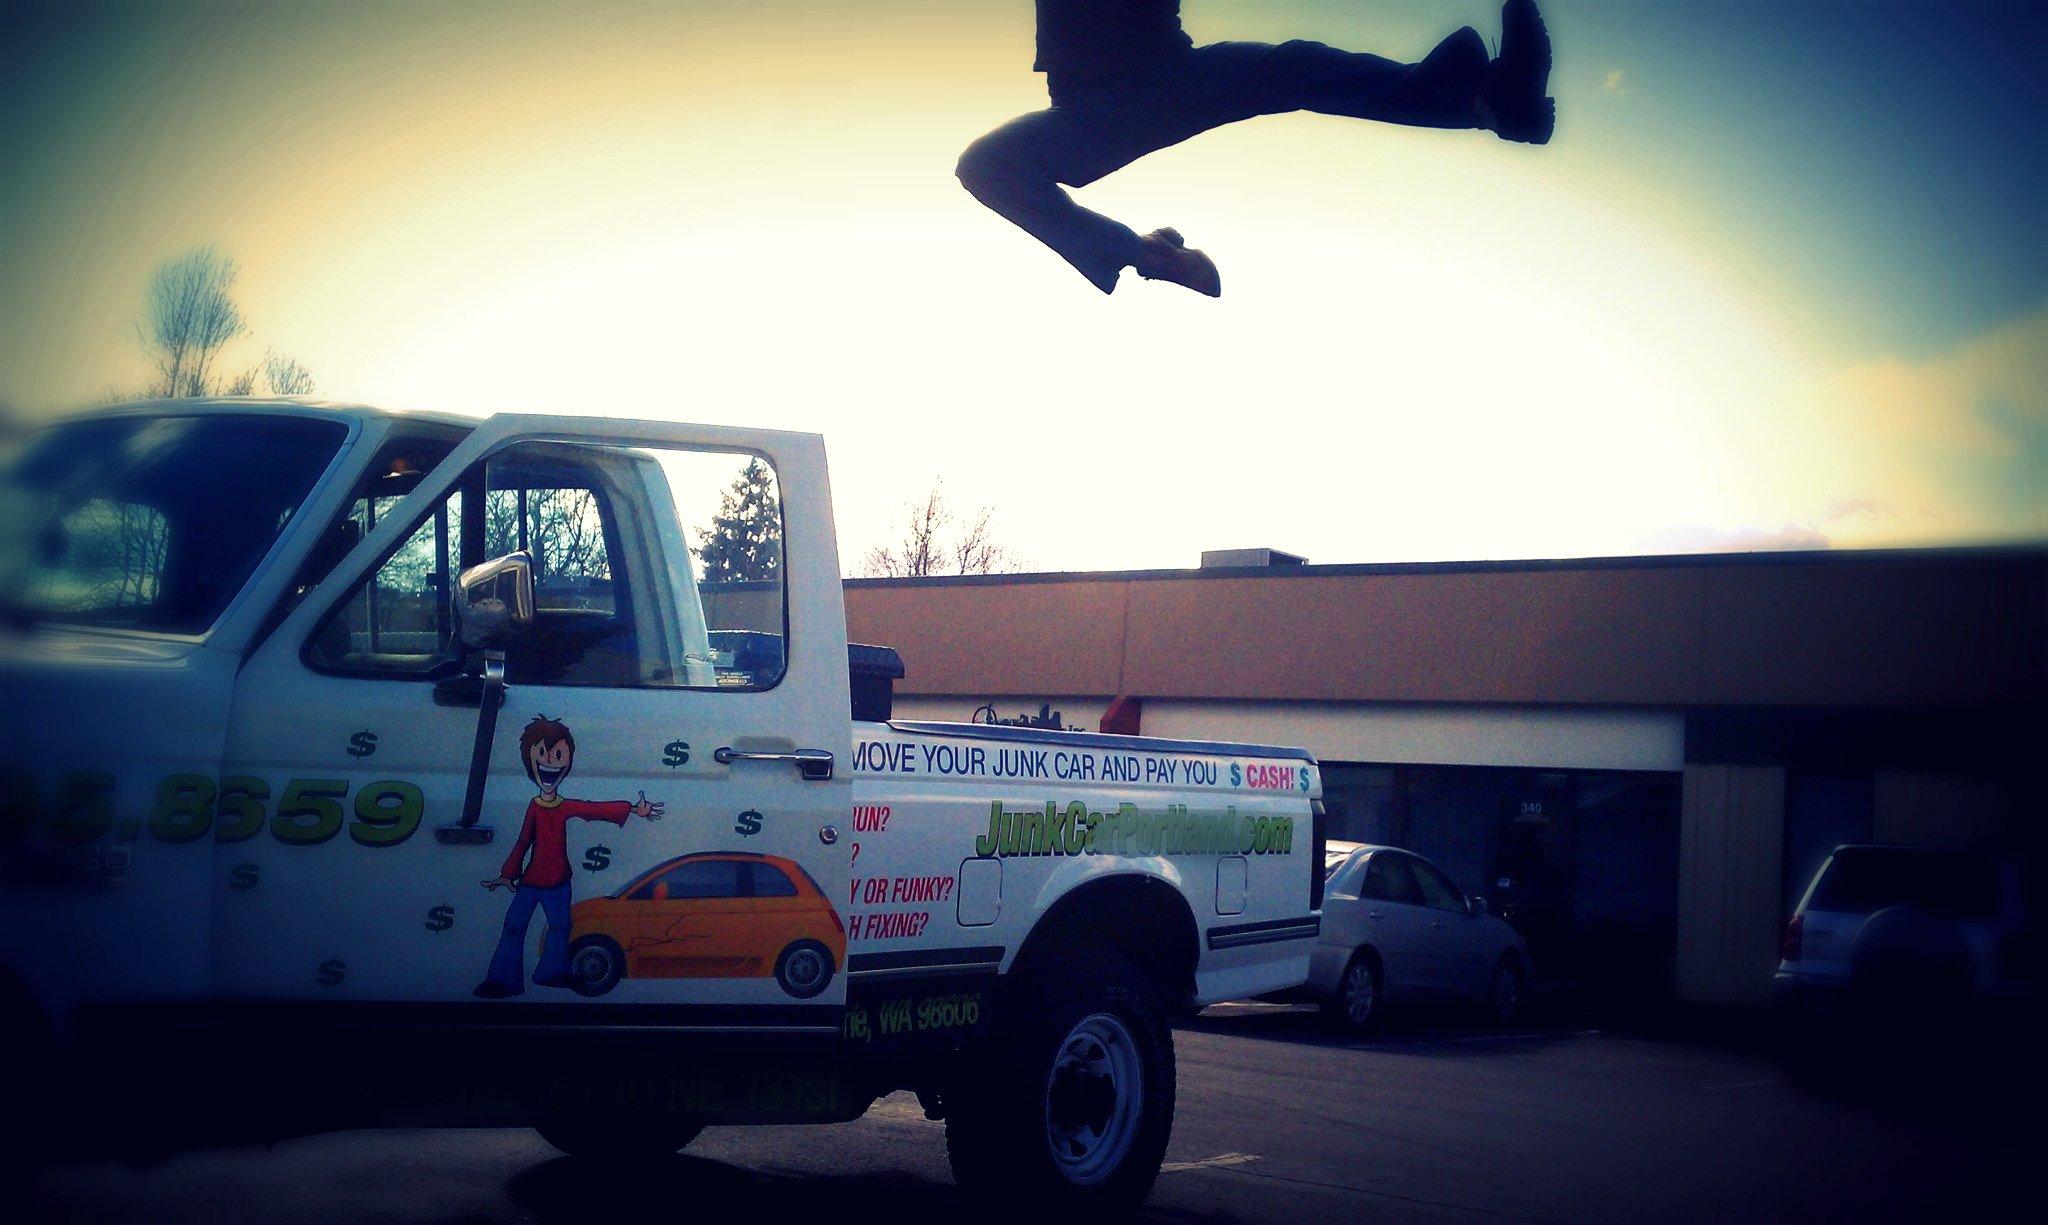 Junk Car Dallas - Cash For Cars